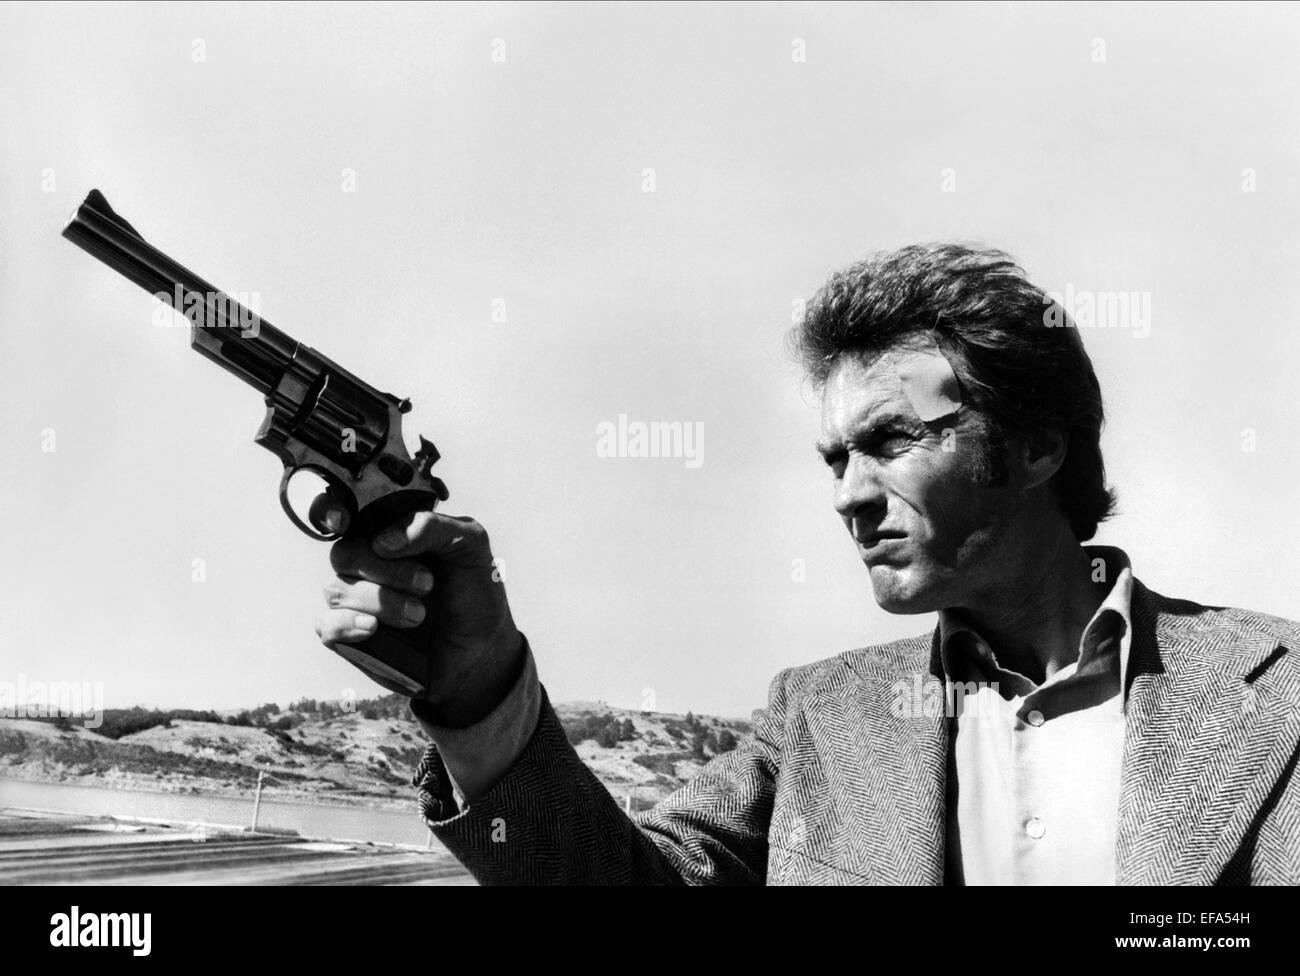 Dirty Harry 2